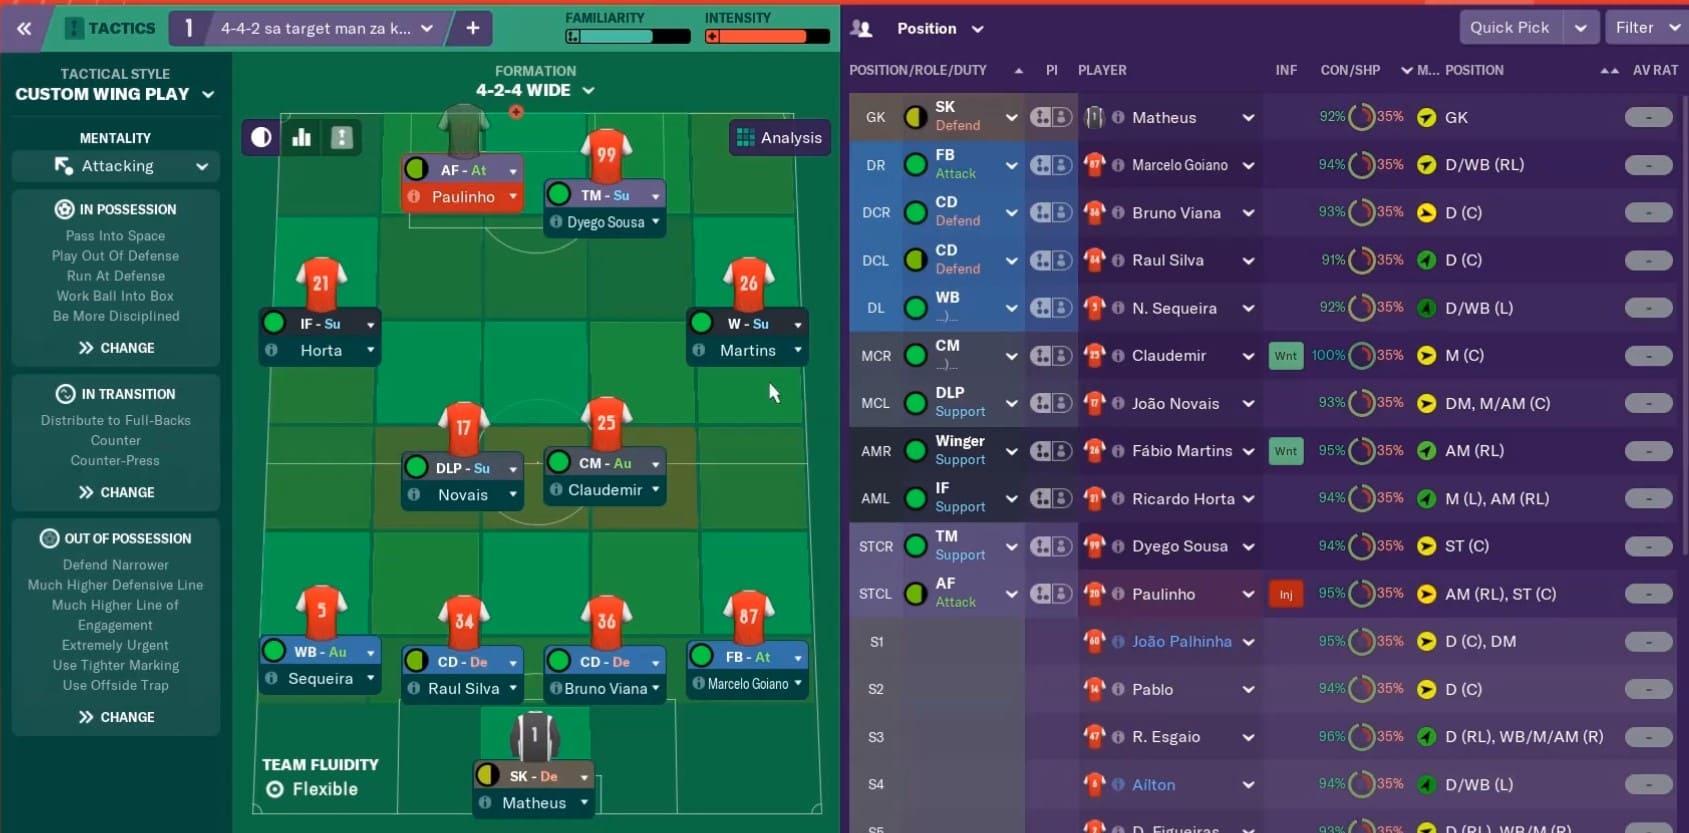 Braga FM19 Team Guide - Get That Title With FC Braga